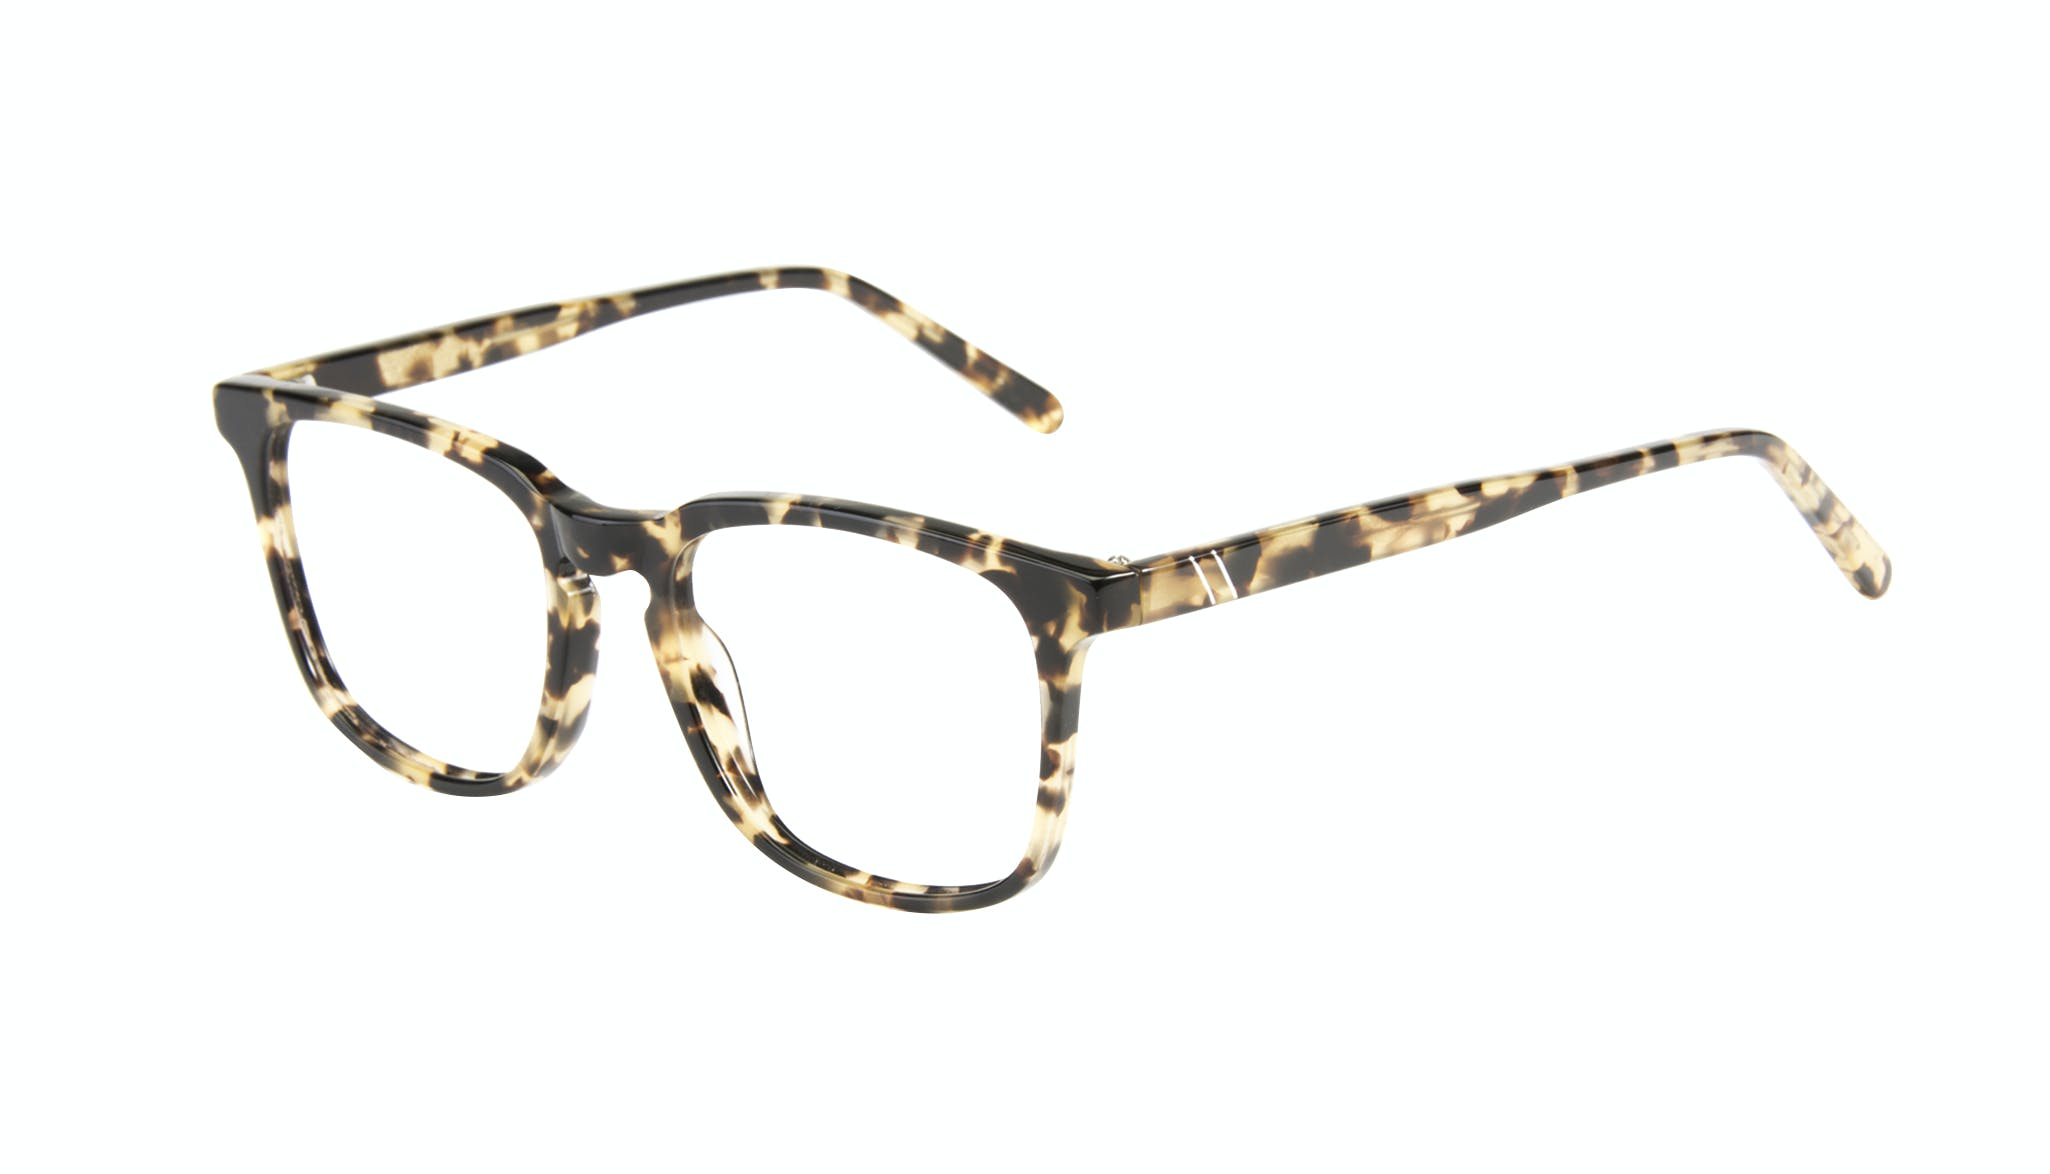 Affordable Fashion Glasses Rectangle Eyeglasses Men Trace Tortoise Tilt